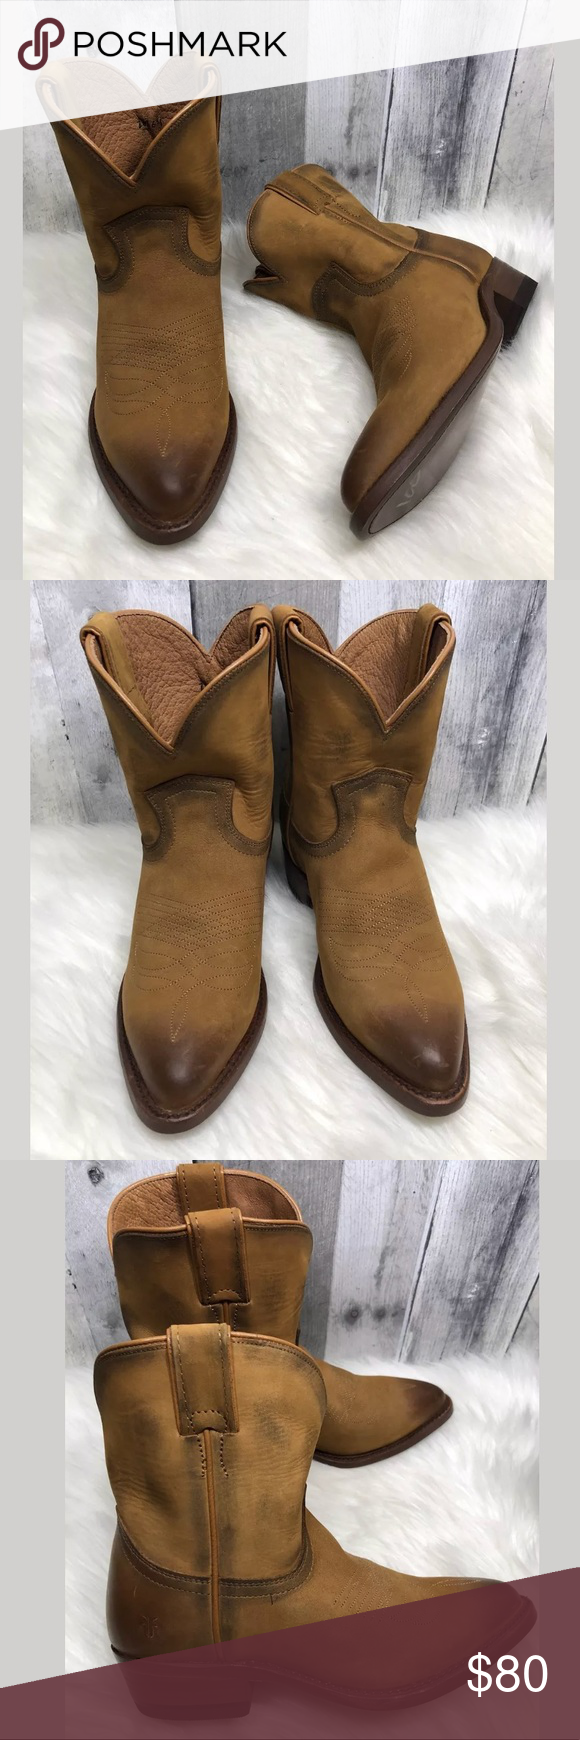 4688e8529e8 NWOT Frye Billy Short Distressed Cowboy Boots $288 New Womens Frye ...